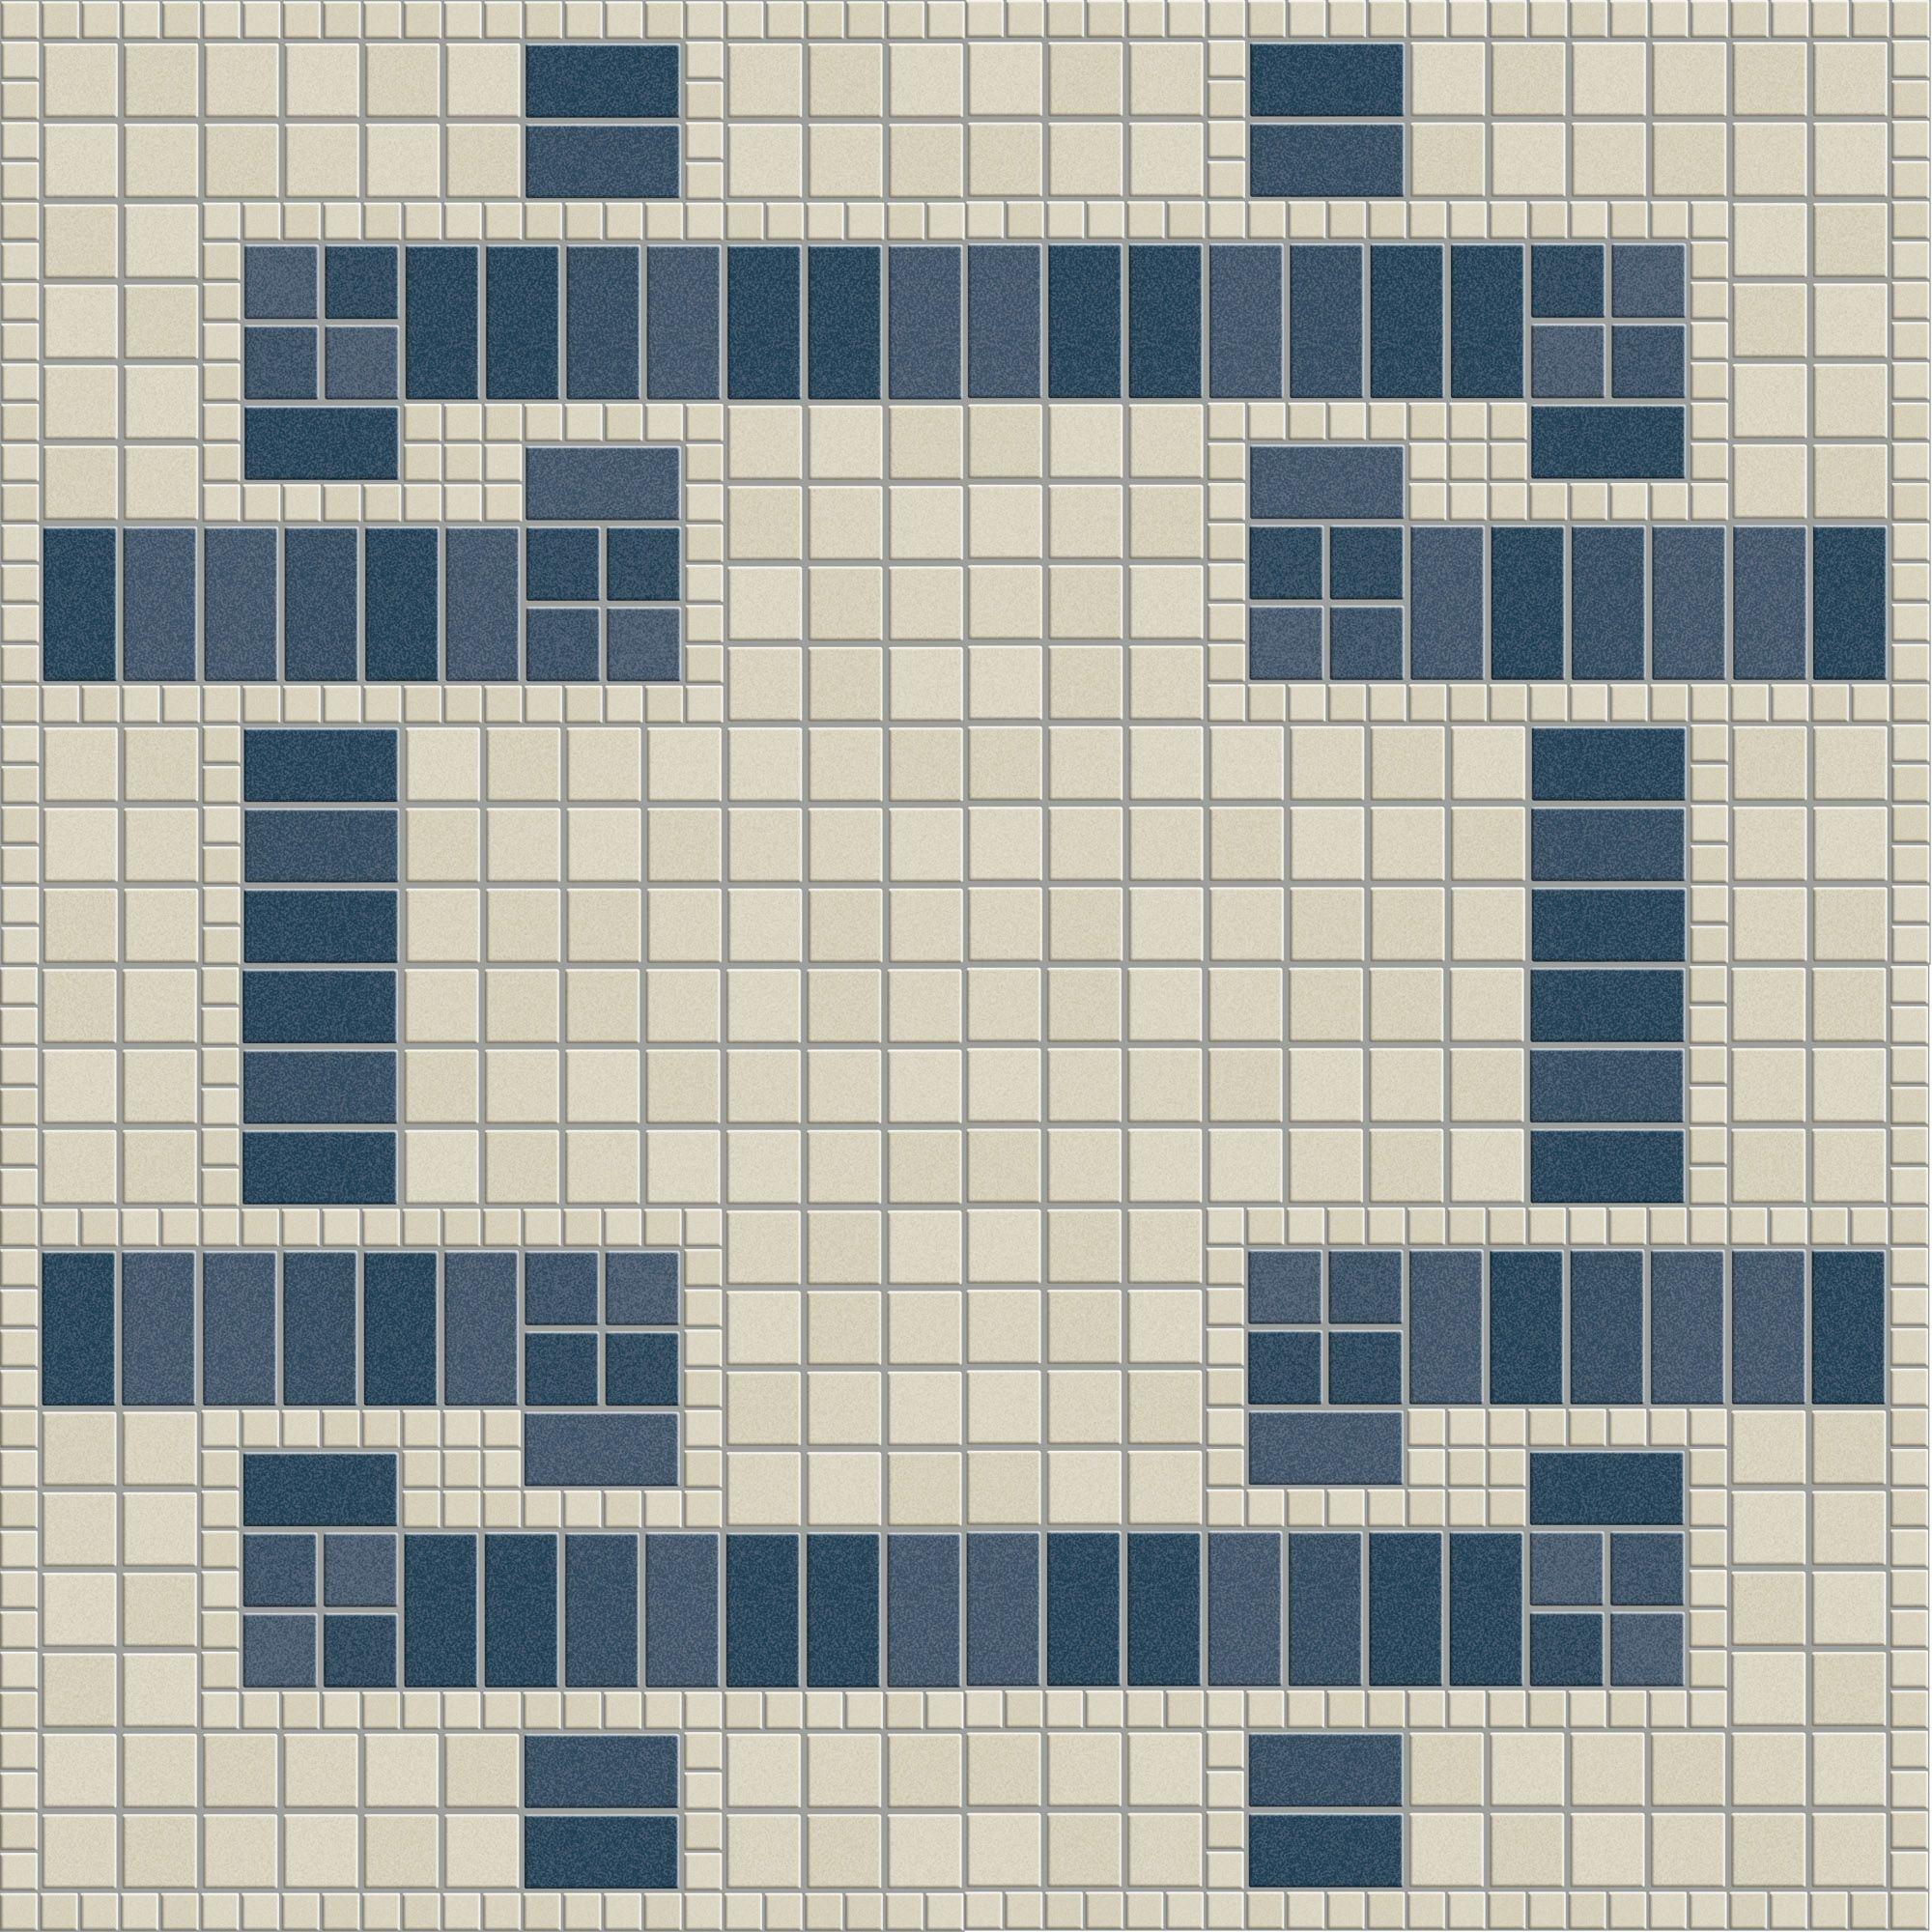 Mosaico in ceramica monocottura sintesi by appiani for Mosaico ceramica